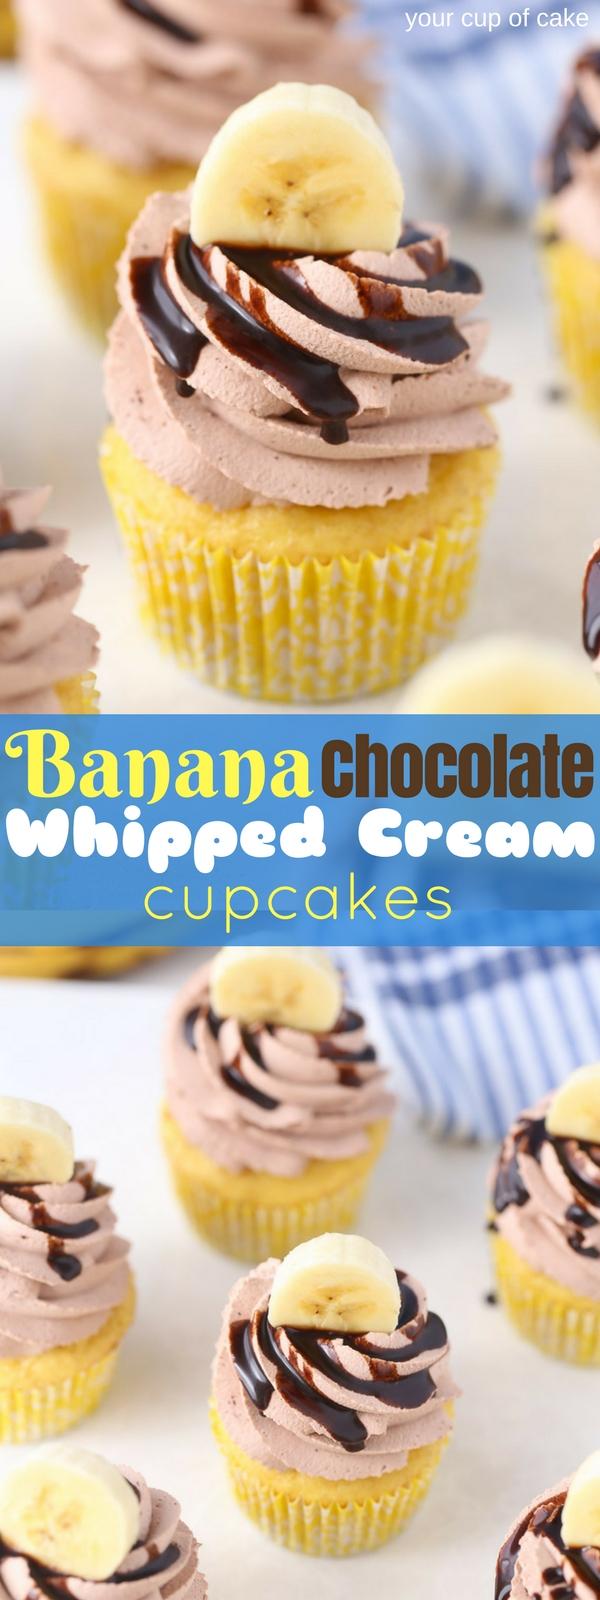 Banana Chocolate Whipped Cream Cupcakes